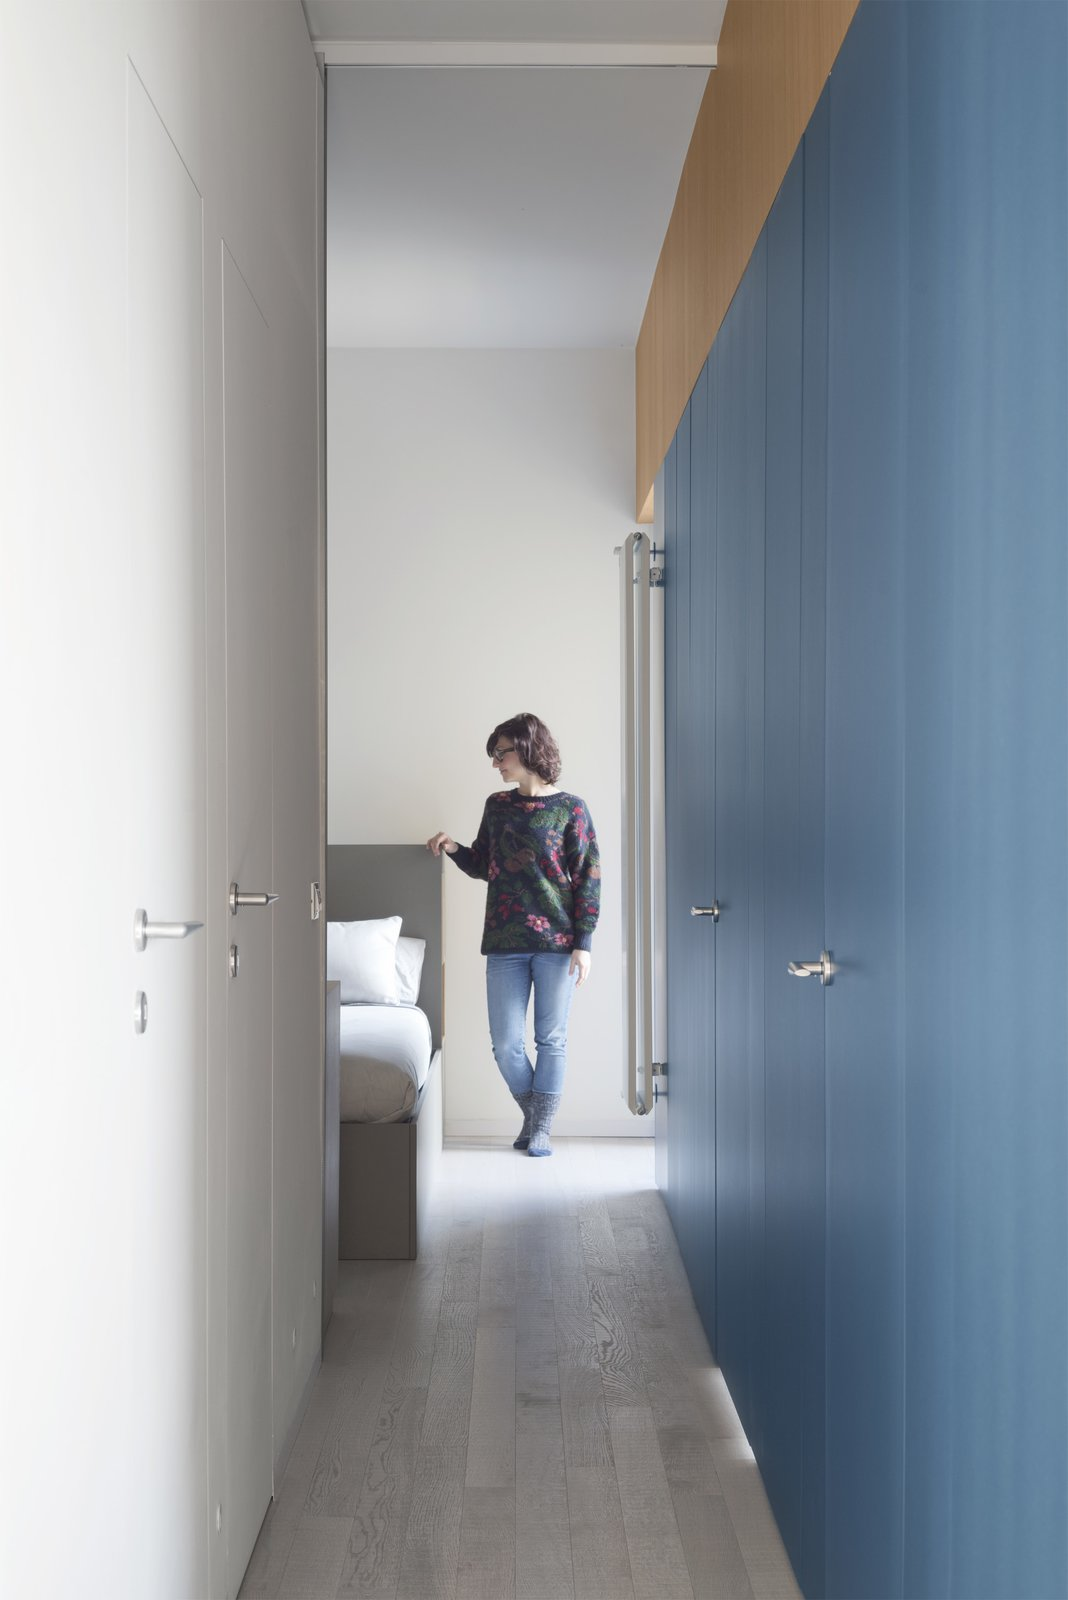 Hallway The corridor, with the mirrored door opened  Best Doors Swing Sliding Photos from Into the Woods